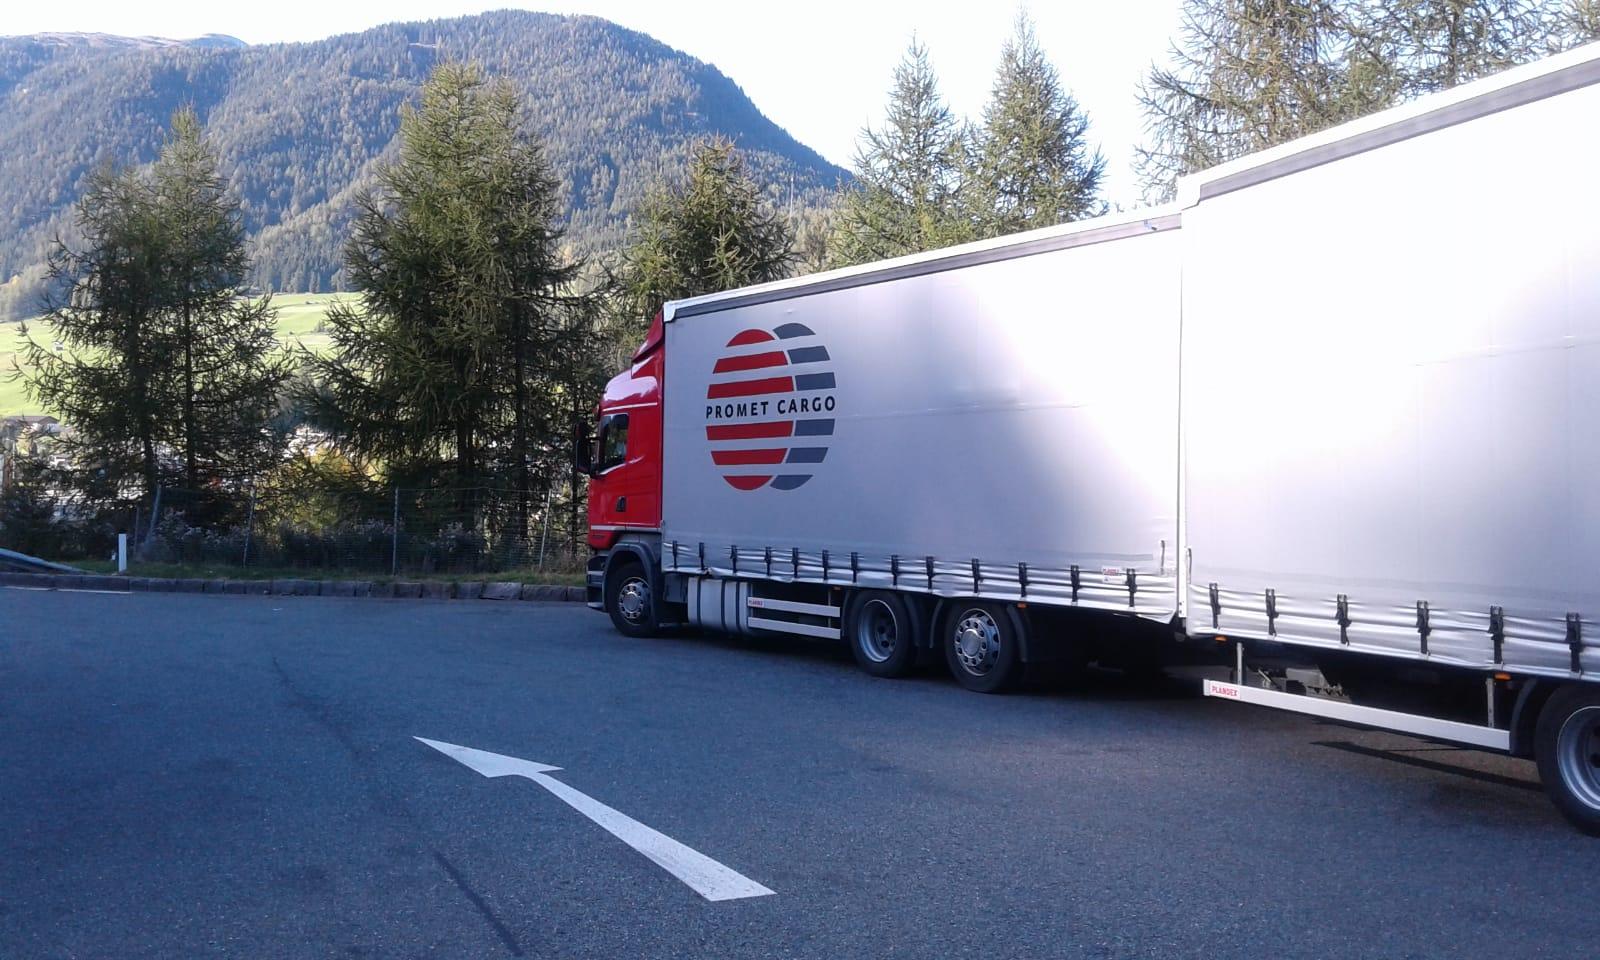 Promet Cargo Sp. zo.o. - TRANSPORT ET EXPÉDITION - Flotte